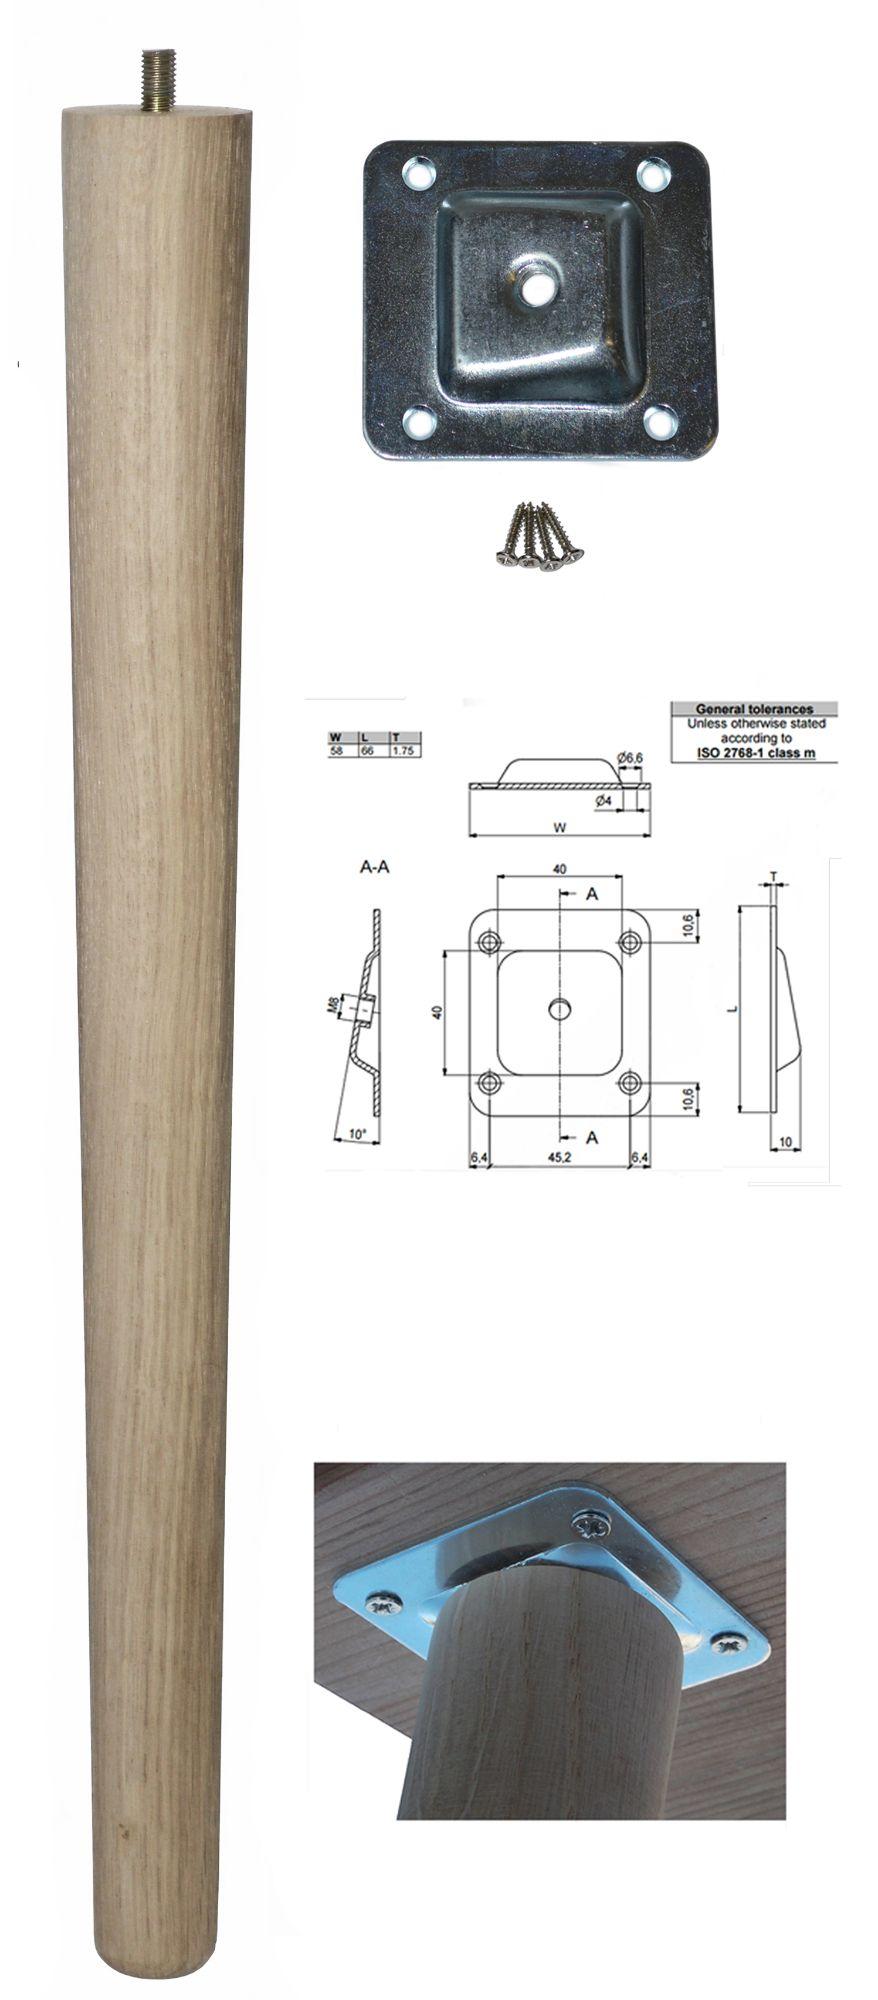 450mm Oak Tapered Leg w/ Angled Fixing Plate